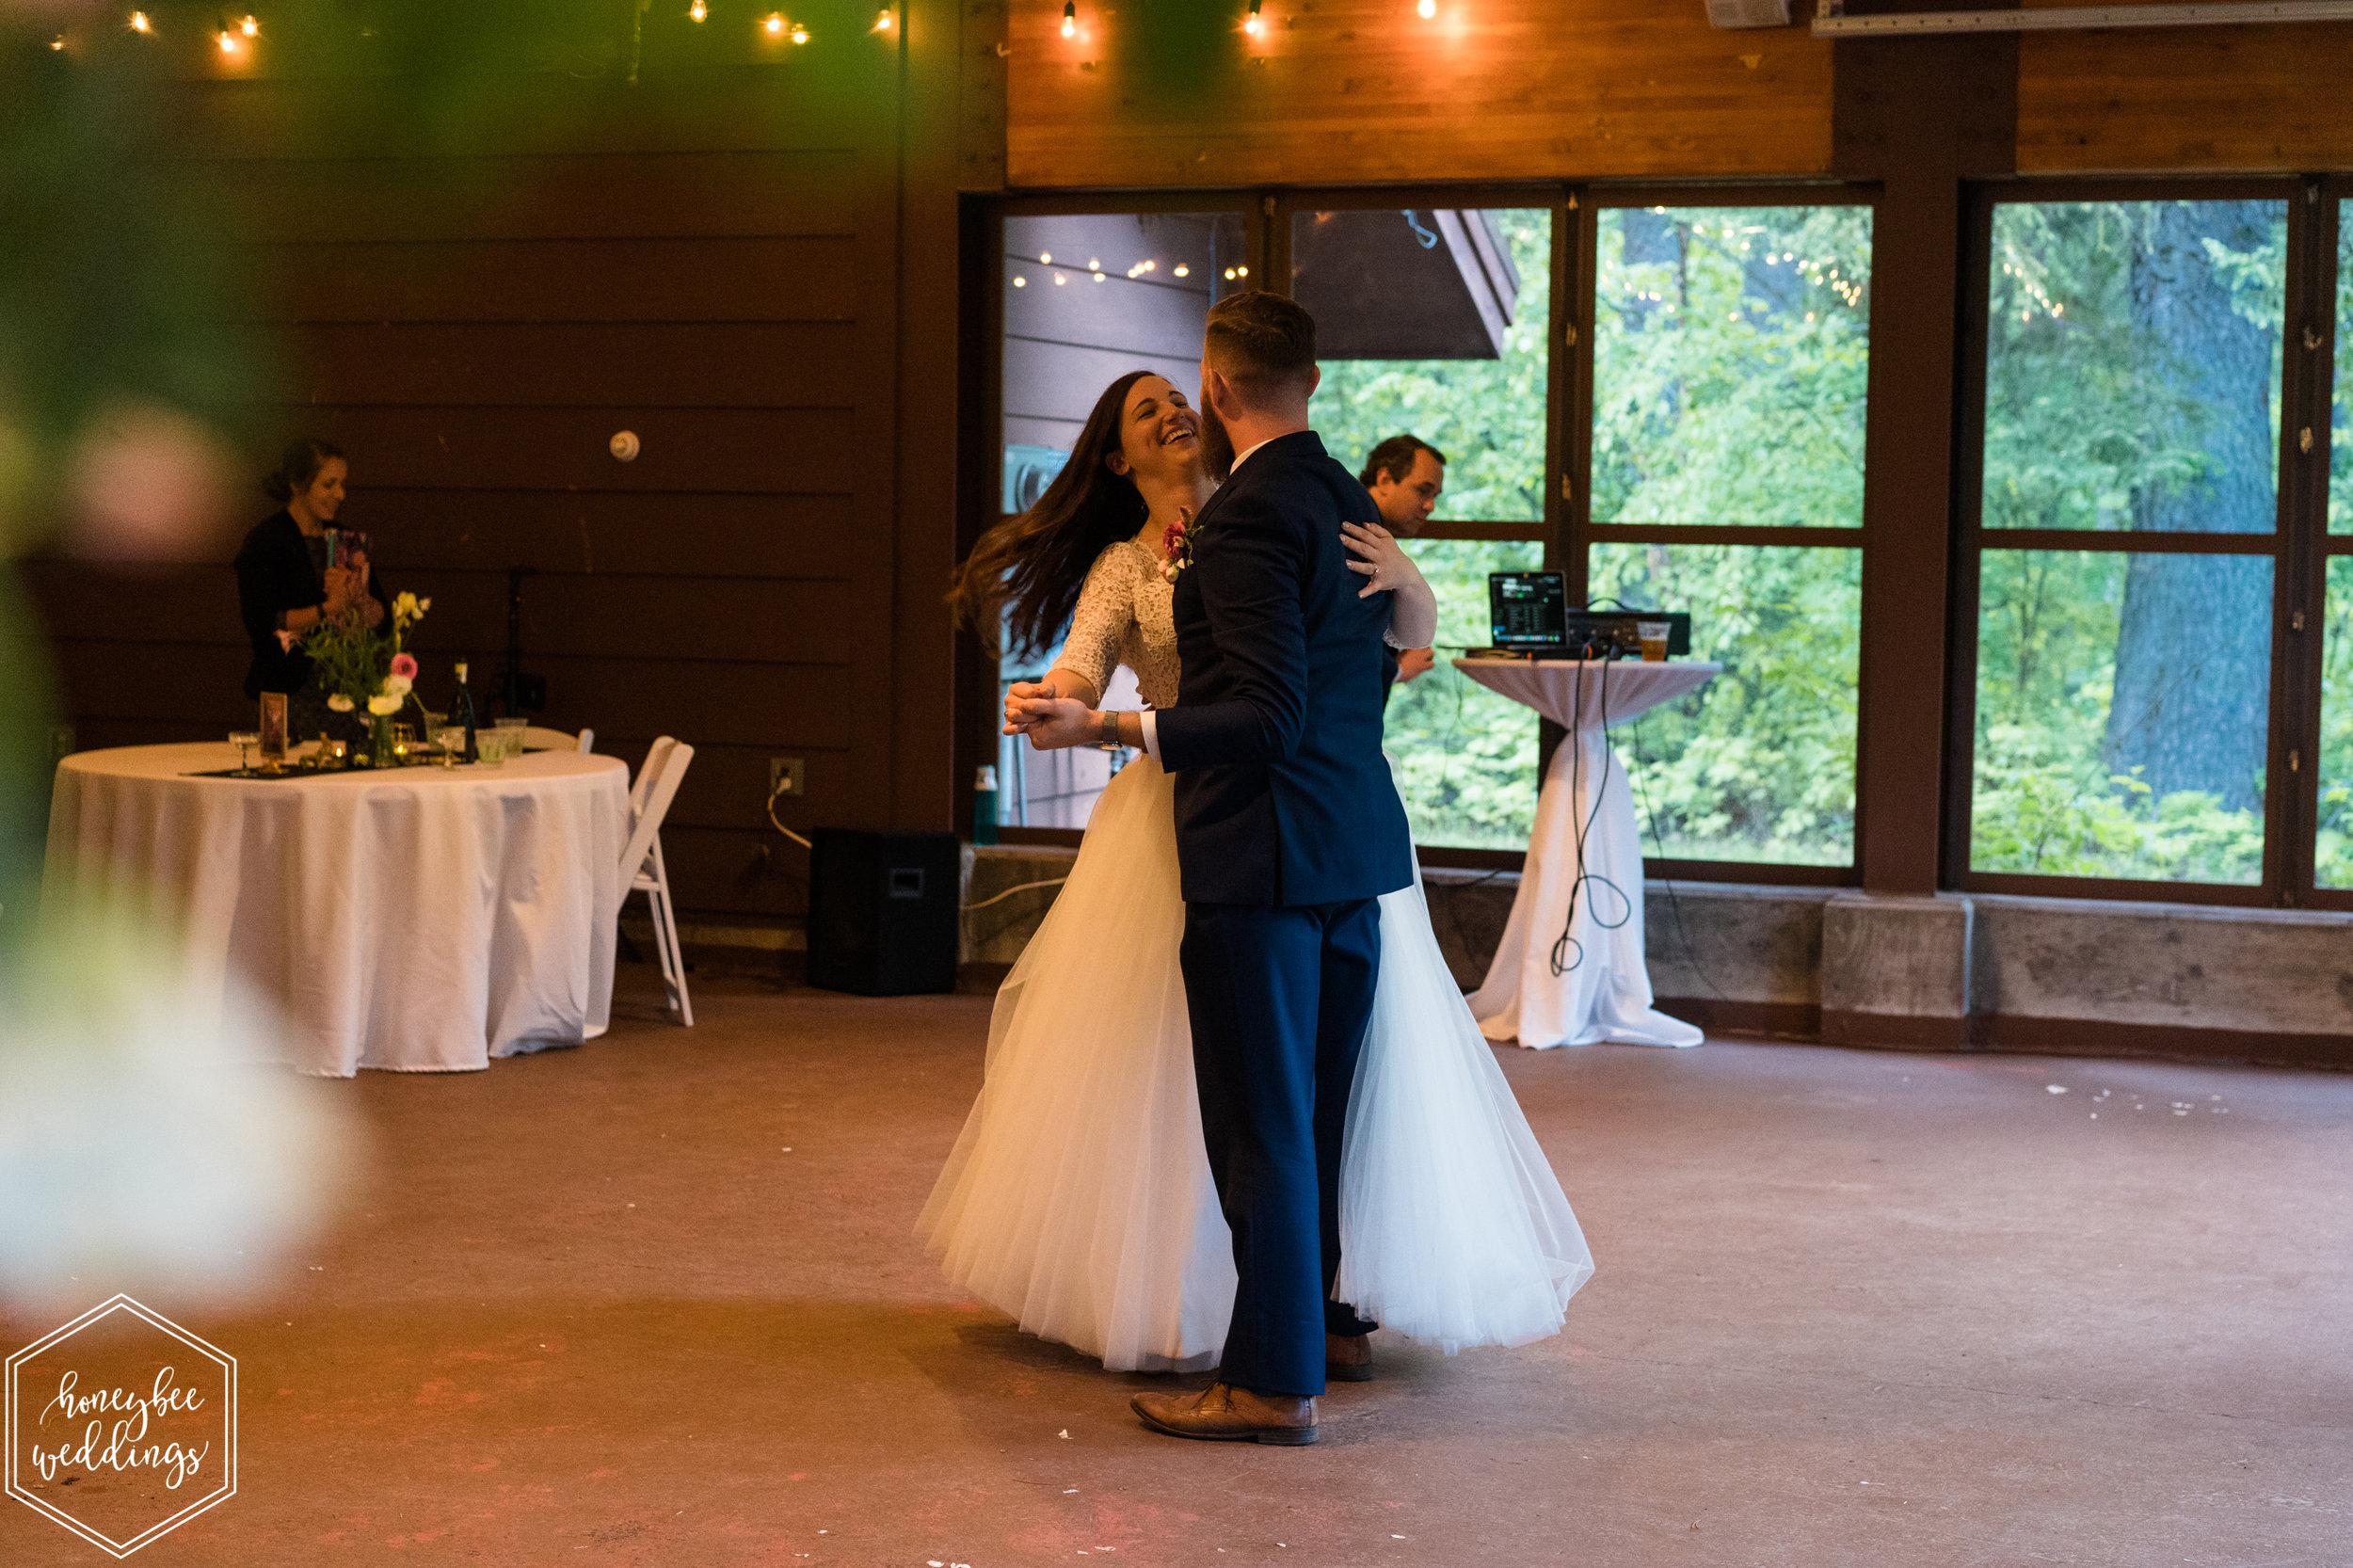 178Glacier National Park Wedding_Izaak Walton Inn Wedding_Honeybee Weddings_Norah & Kyle_June 08, 2019-137.jpg